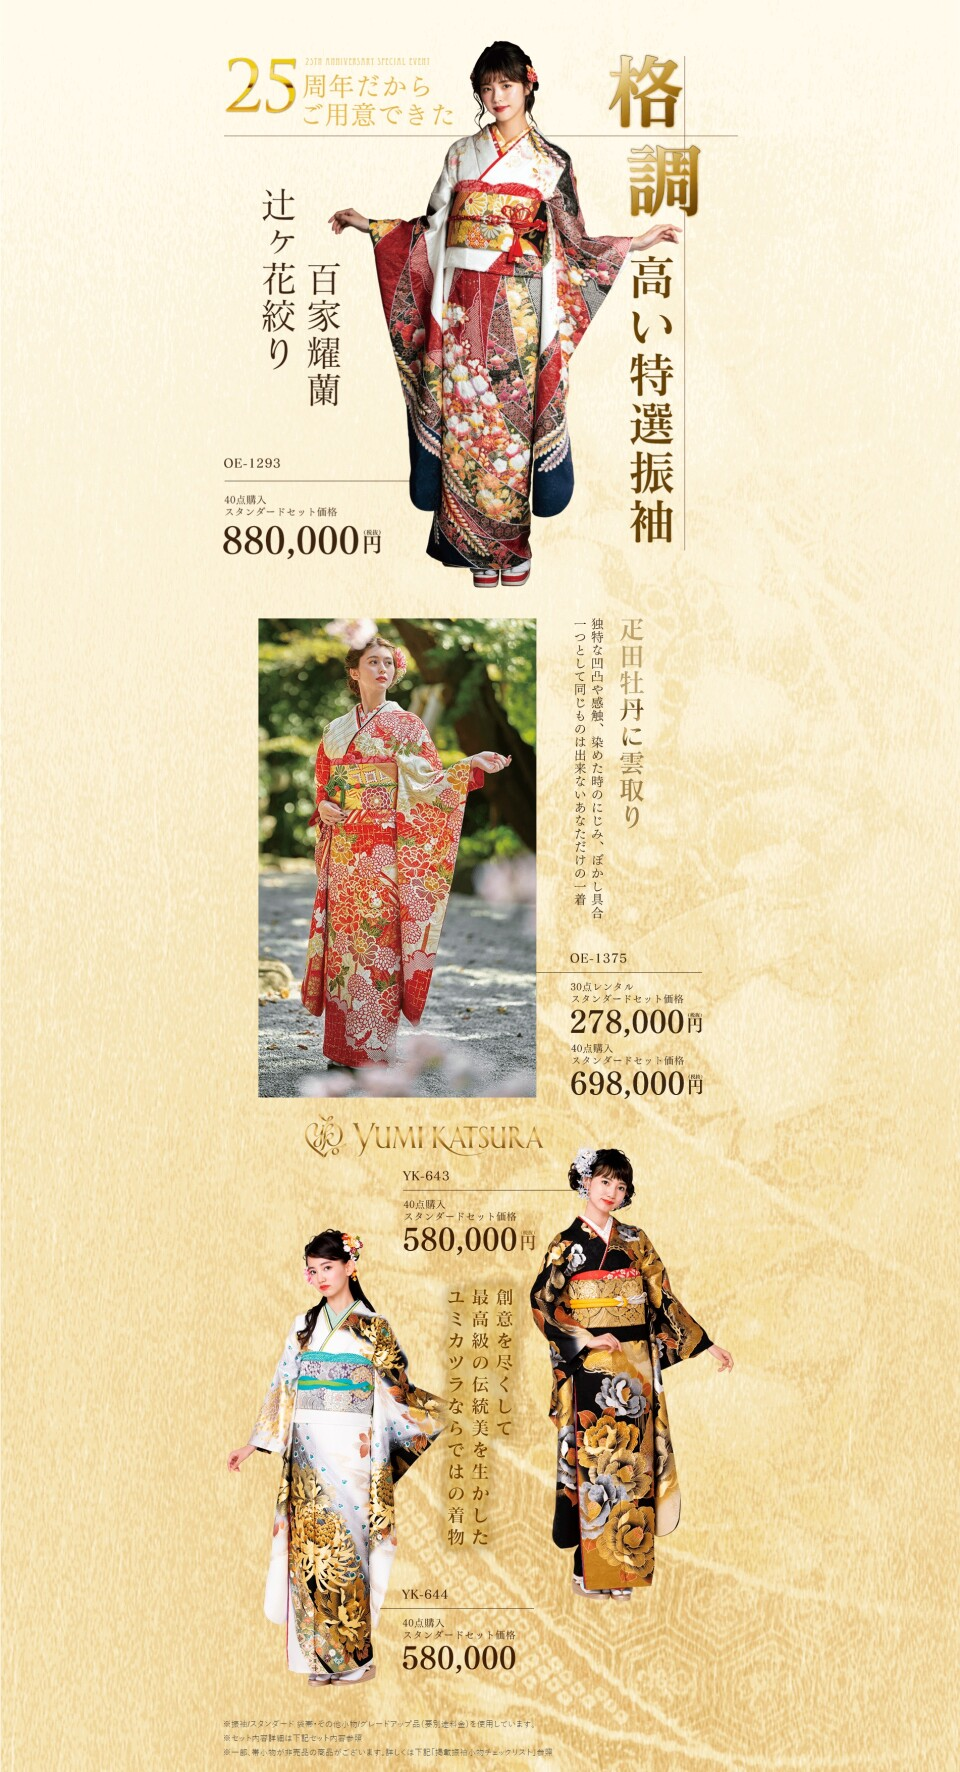 FireShot Capture 921 - オンディーヌ お得な振袖キャンペーン開催!|成人式の振袖レンタル・販売オンディーヌ - www.ondine.jp